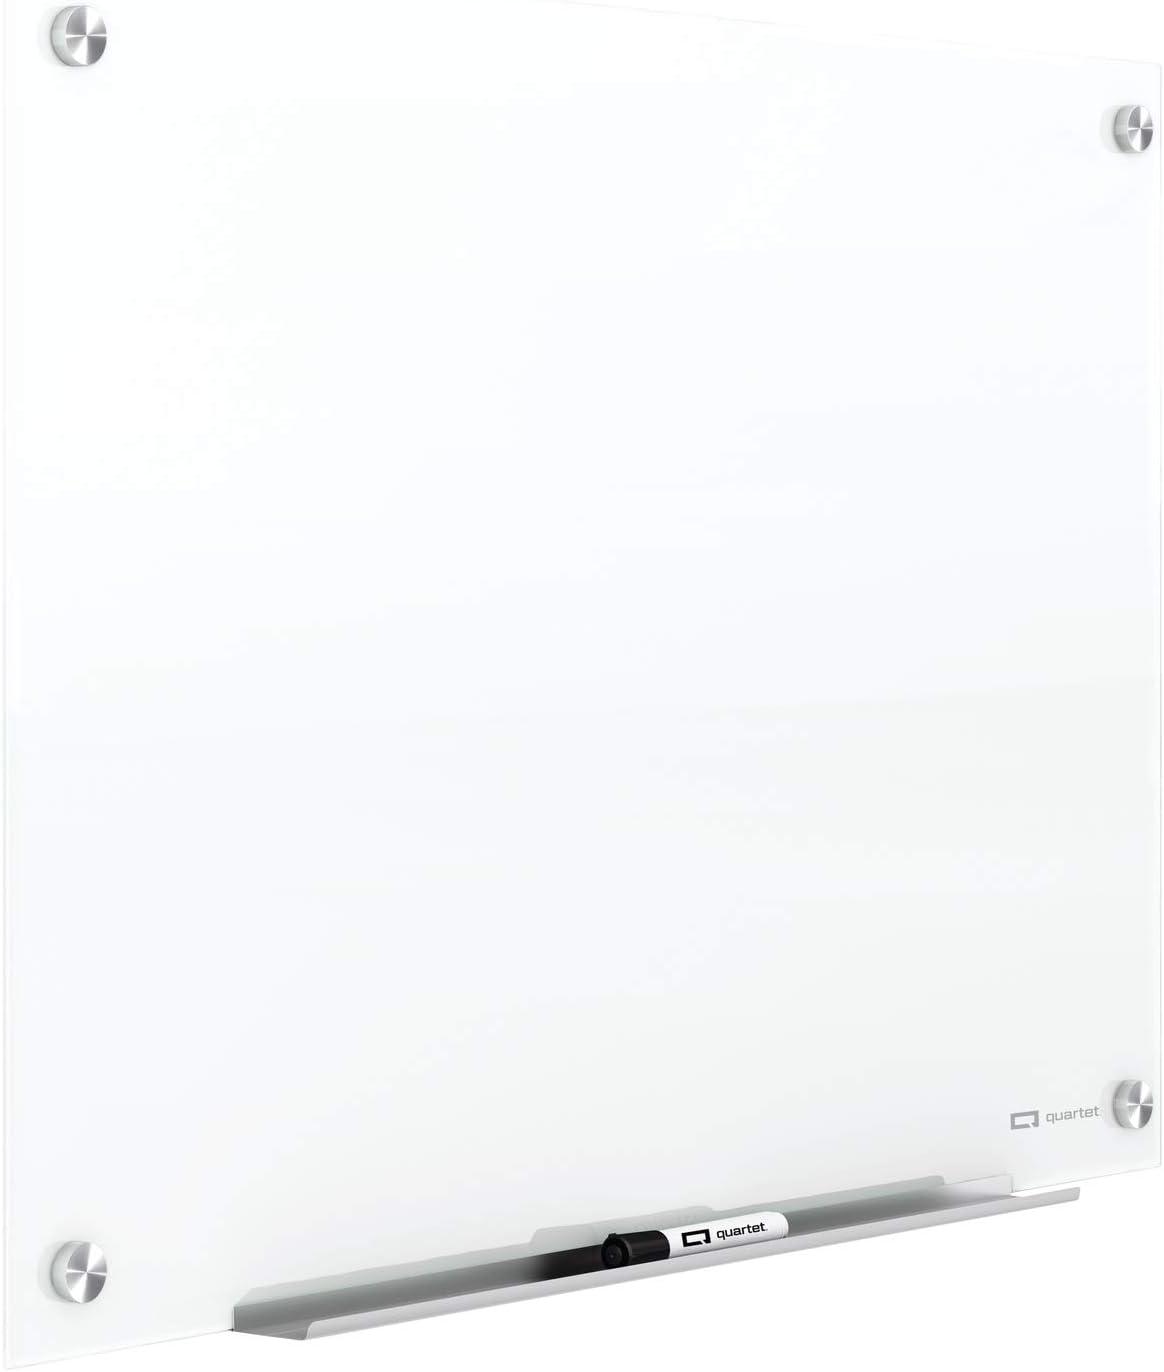 trust Quartet Glass Whiteboard Magnetic Dry Bombing free shipping Erase 1 x 2' Board White